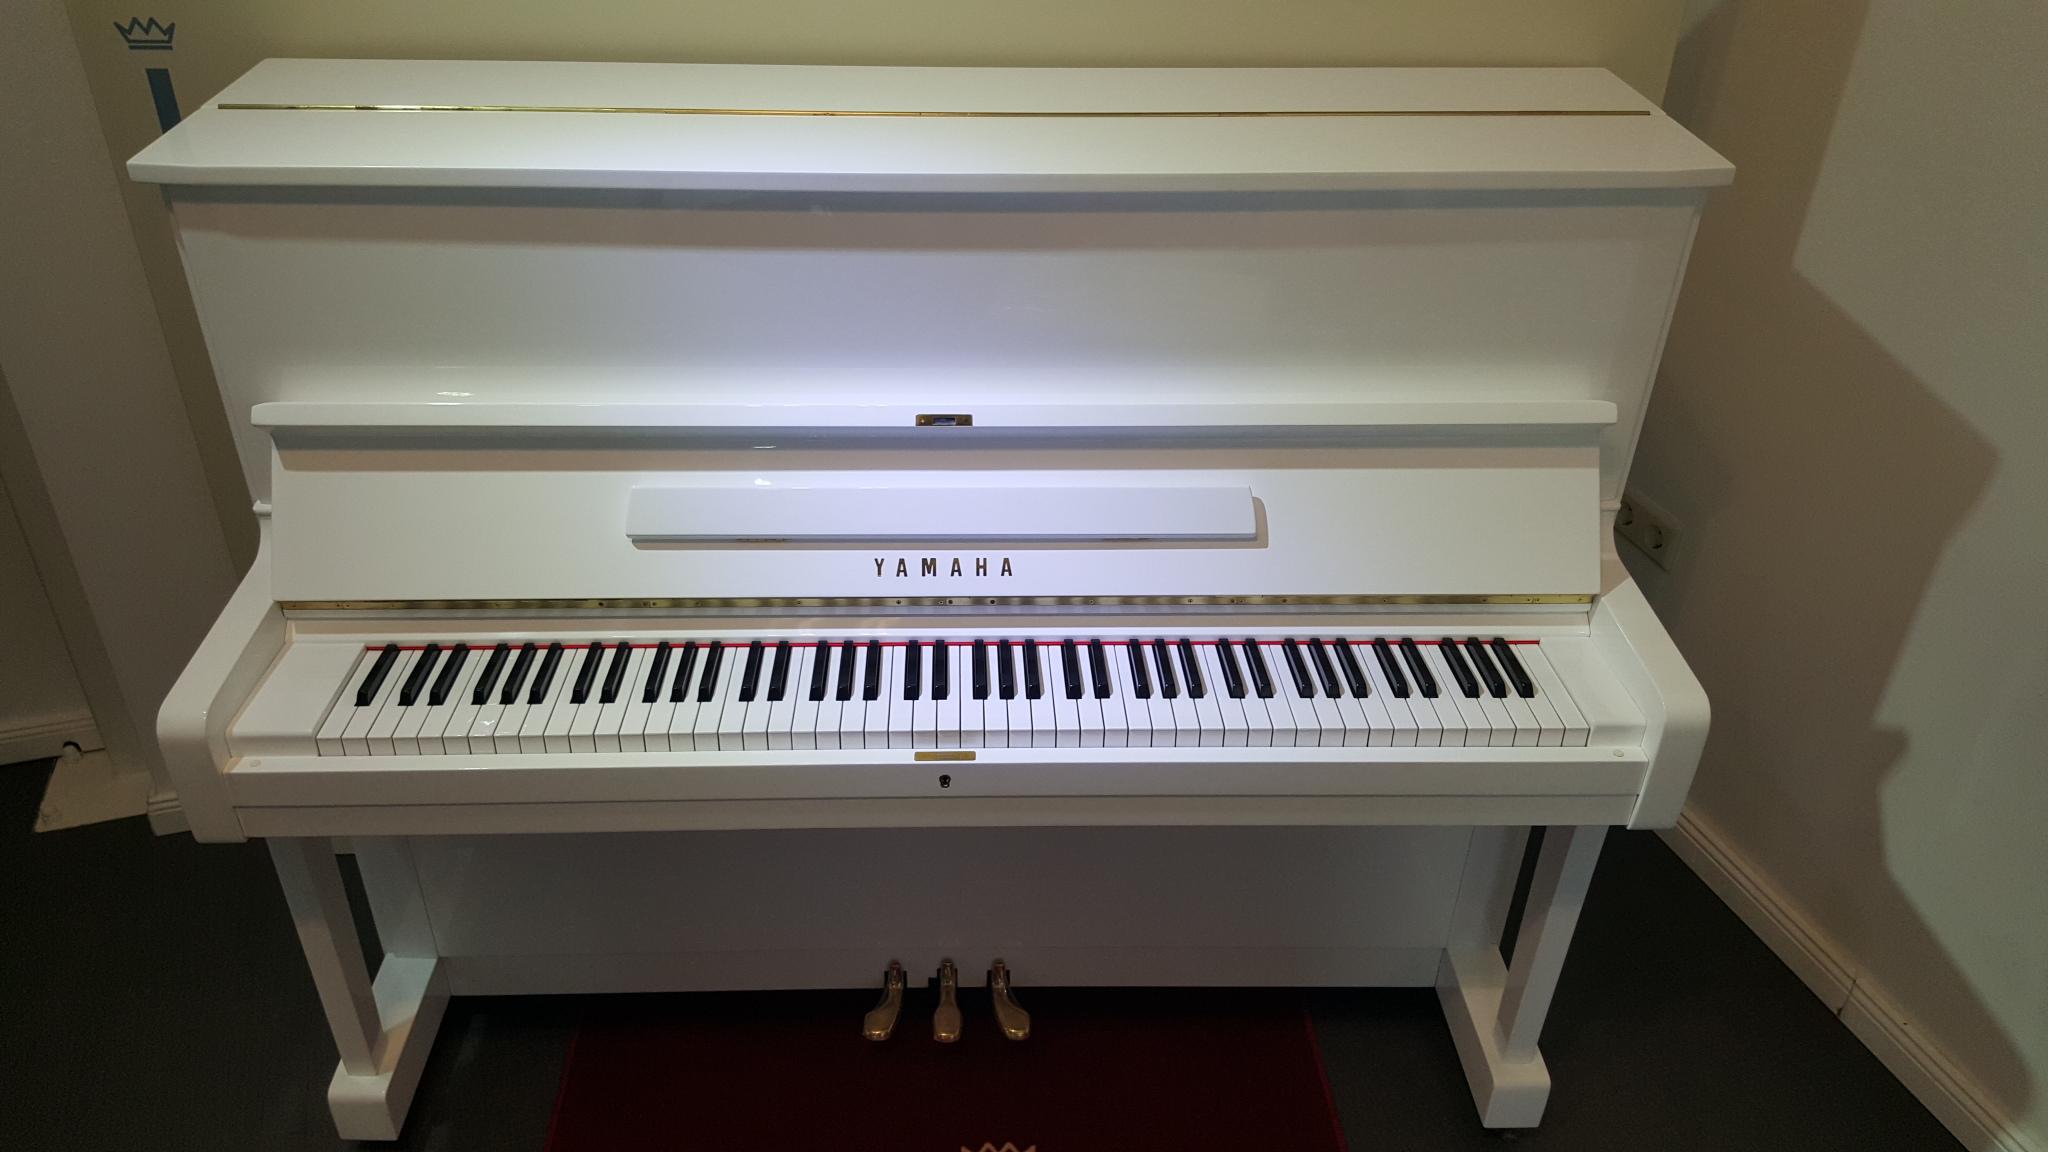 yamaha klaviere berlin pianohaus listmann 030 66933733. Black Bedroom Furniture Sets. Home Design Ideas